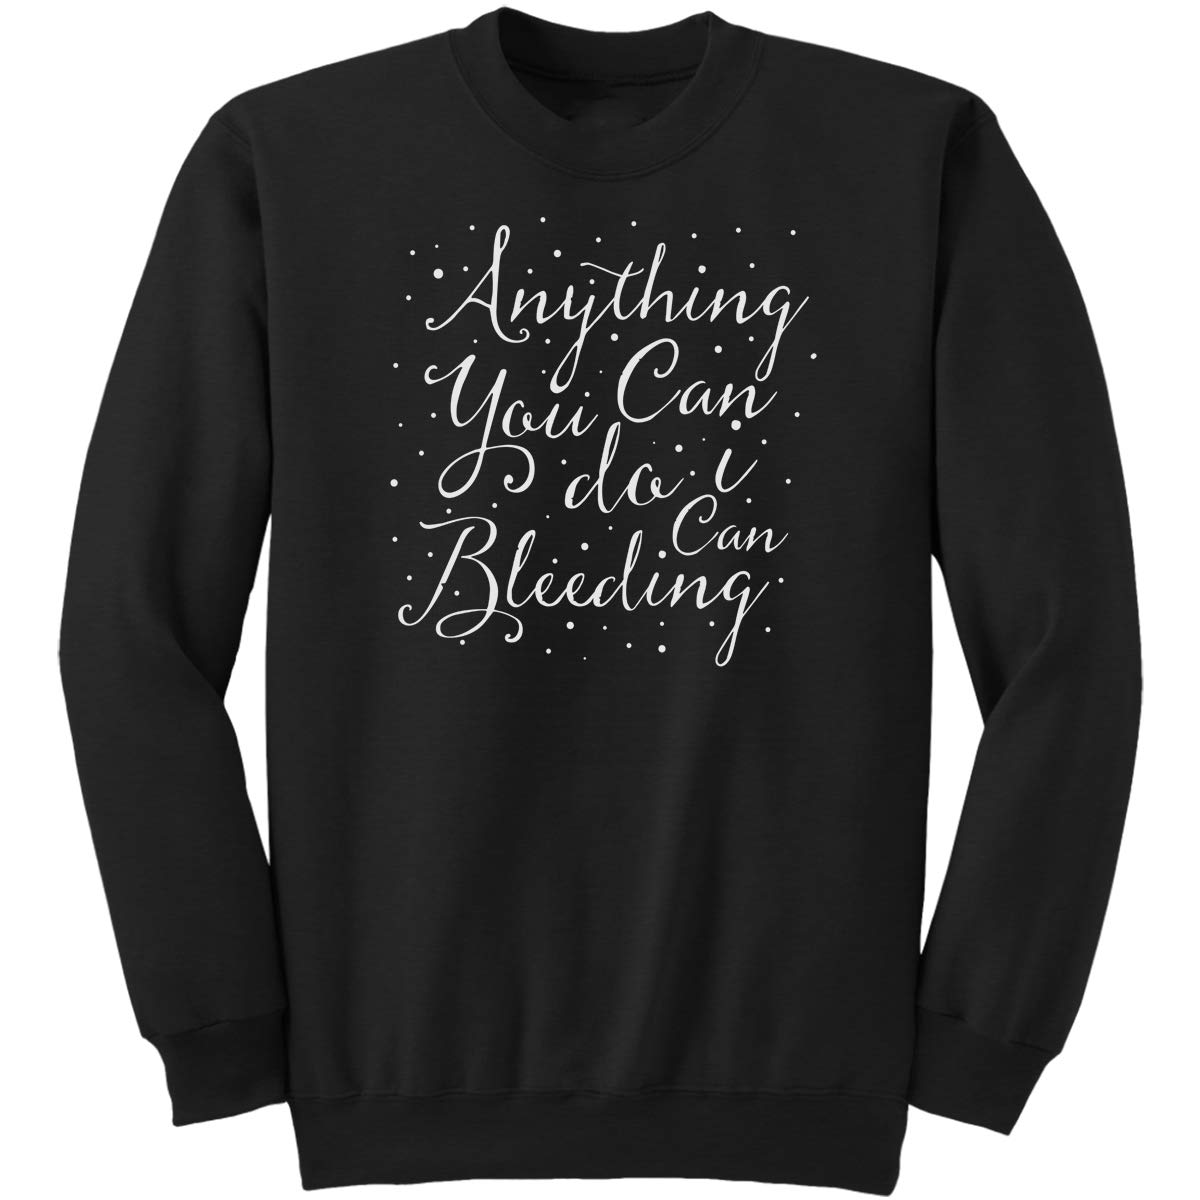 DoozyGifts99 Anything You Can Do I Can Do Bleeding-F Sweatshirt